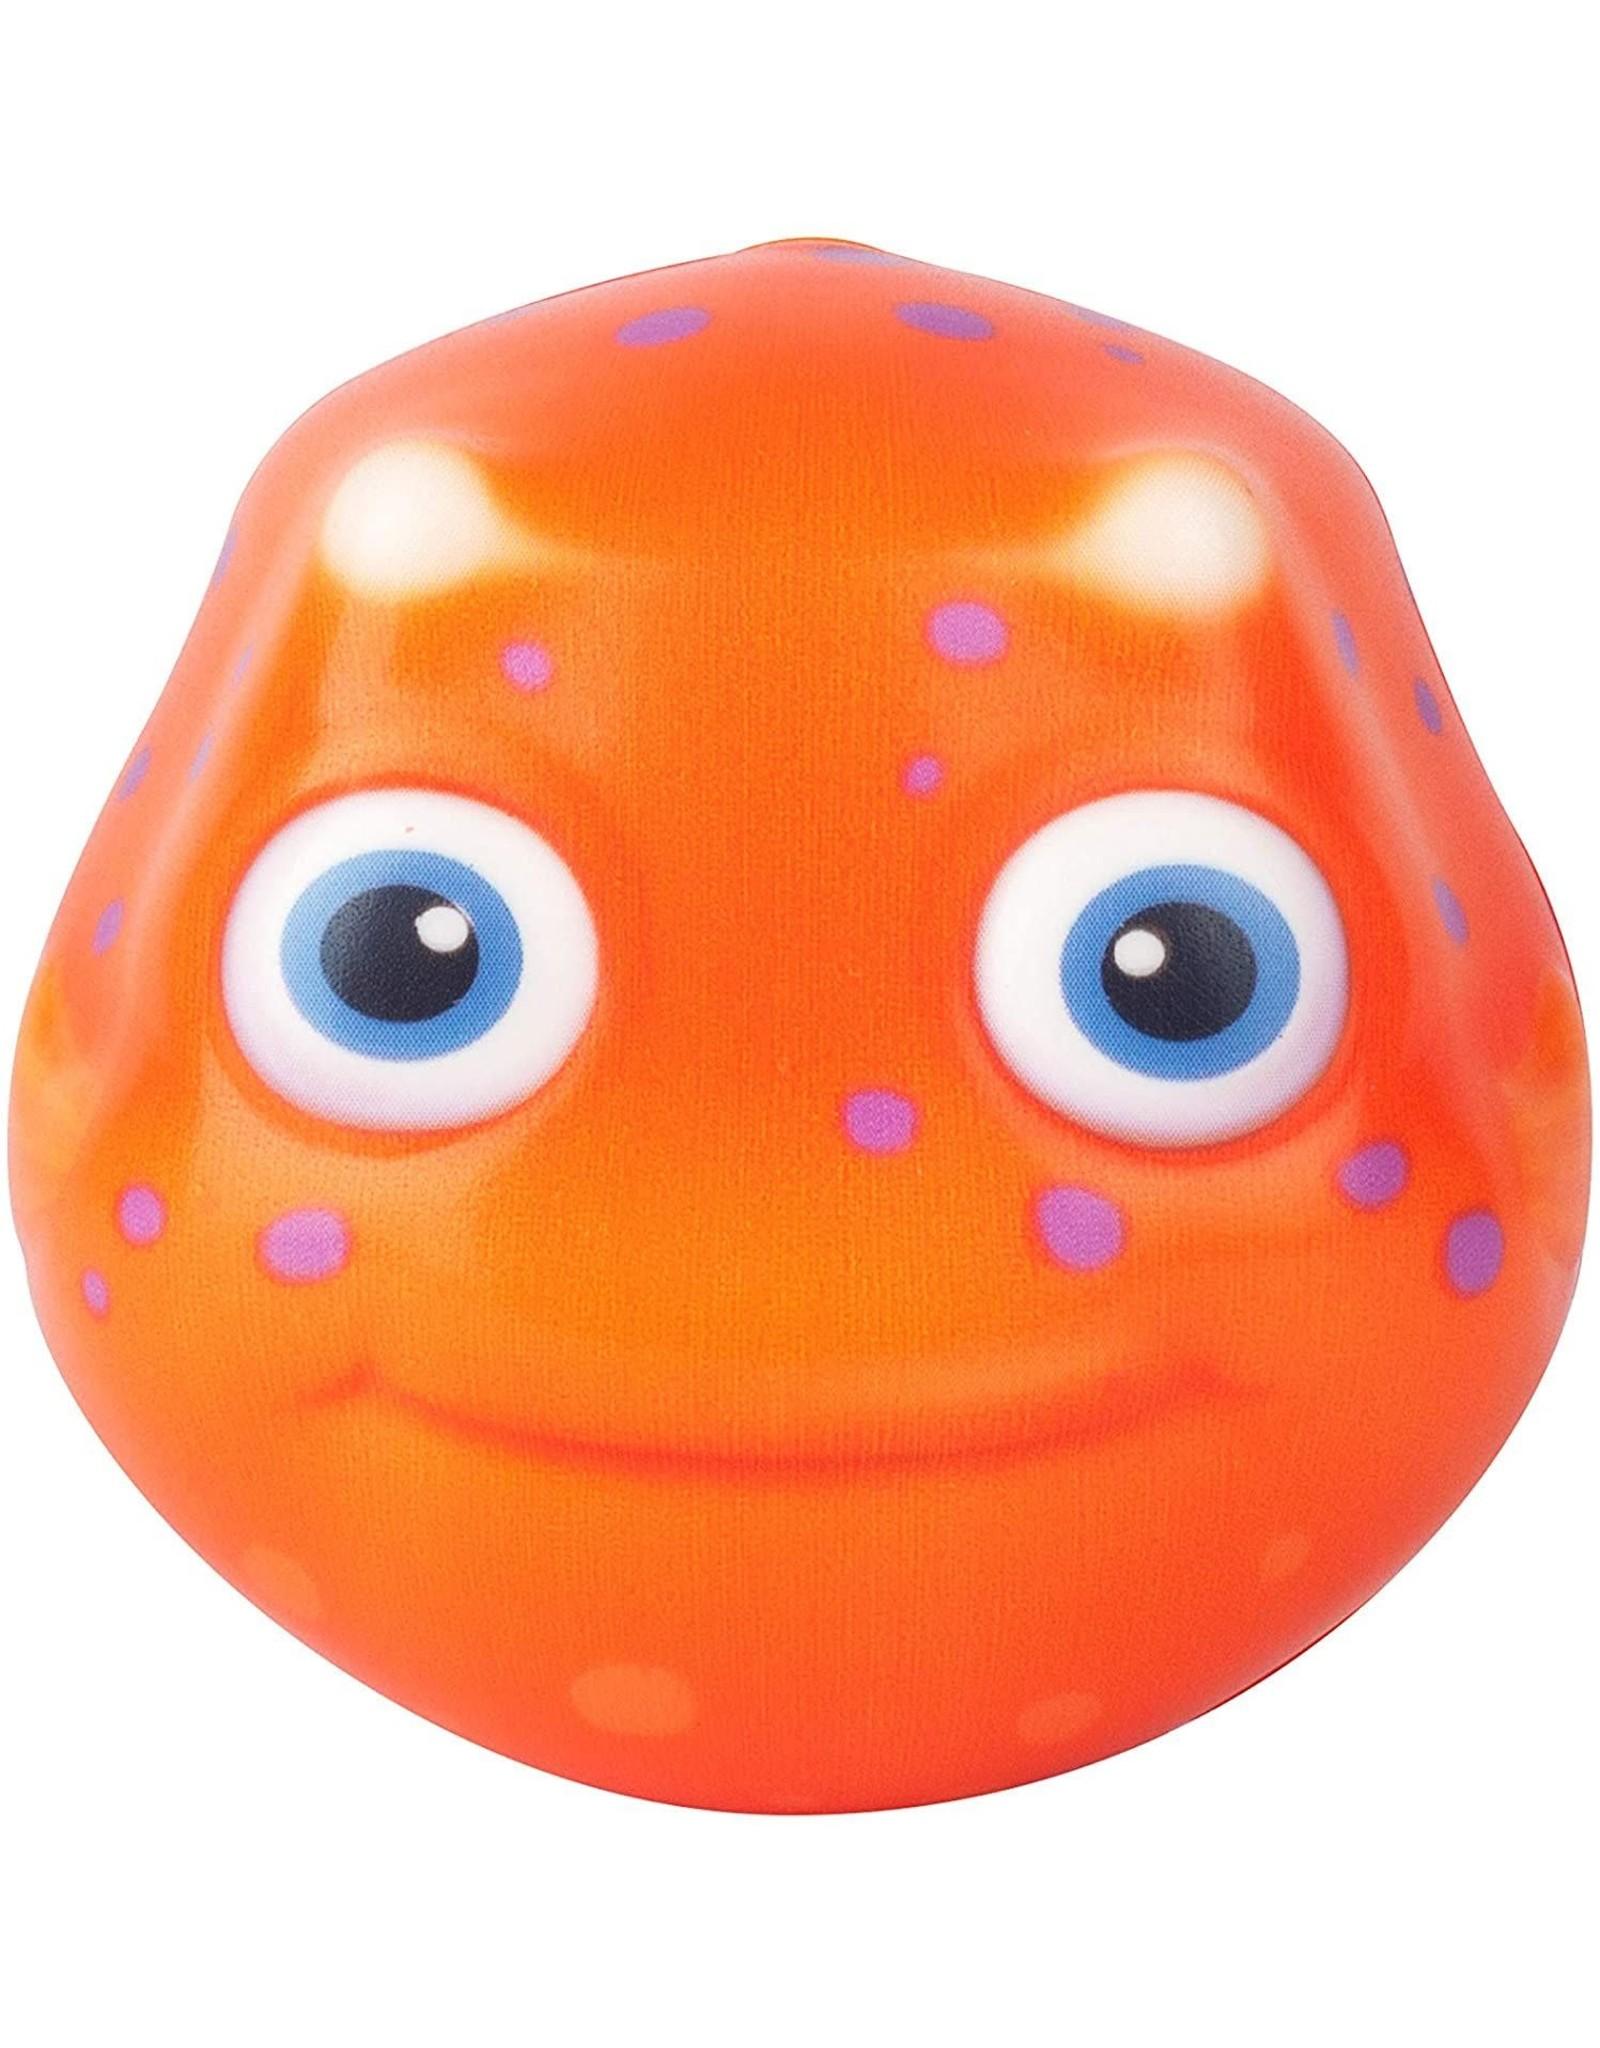 Seanimal Ball - orange box fish